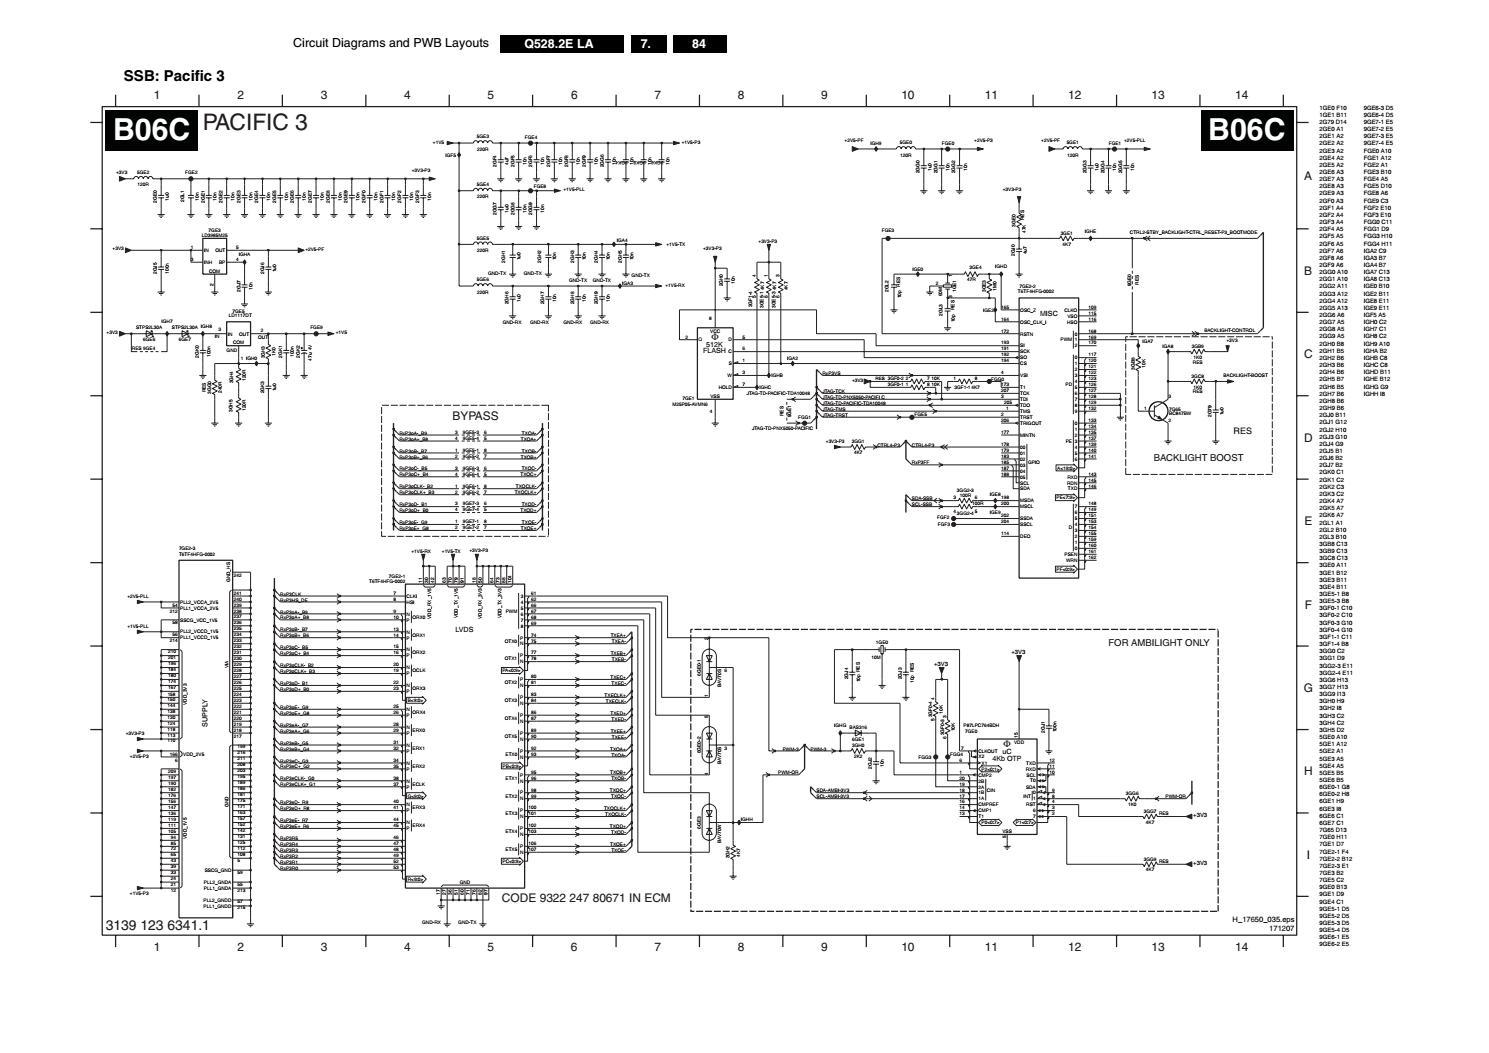 manual de servi u00e7o tv philips 42pfl7603d 12 chassis q528 2e by portal da eletr u00f4nica